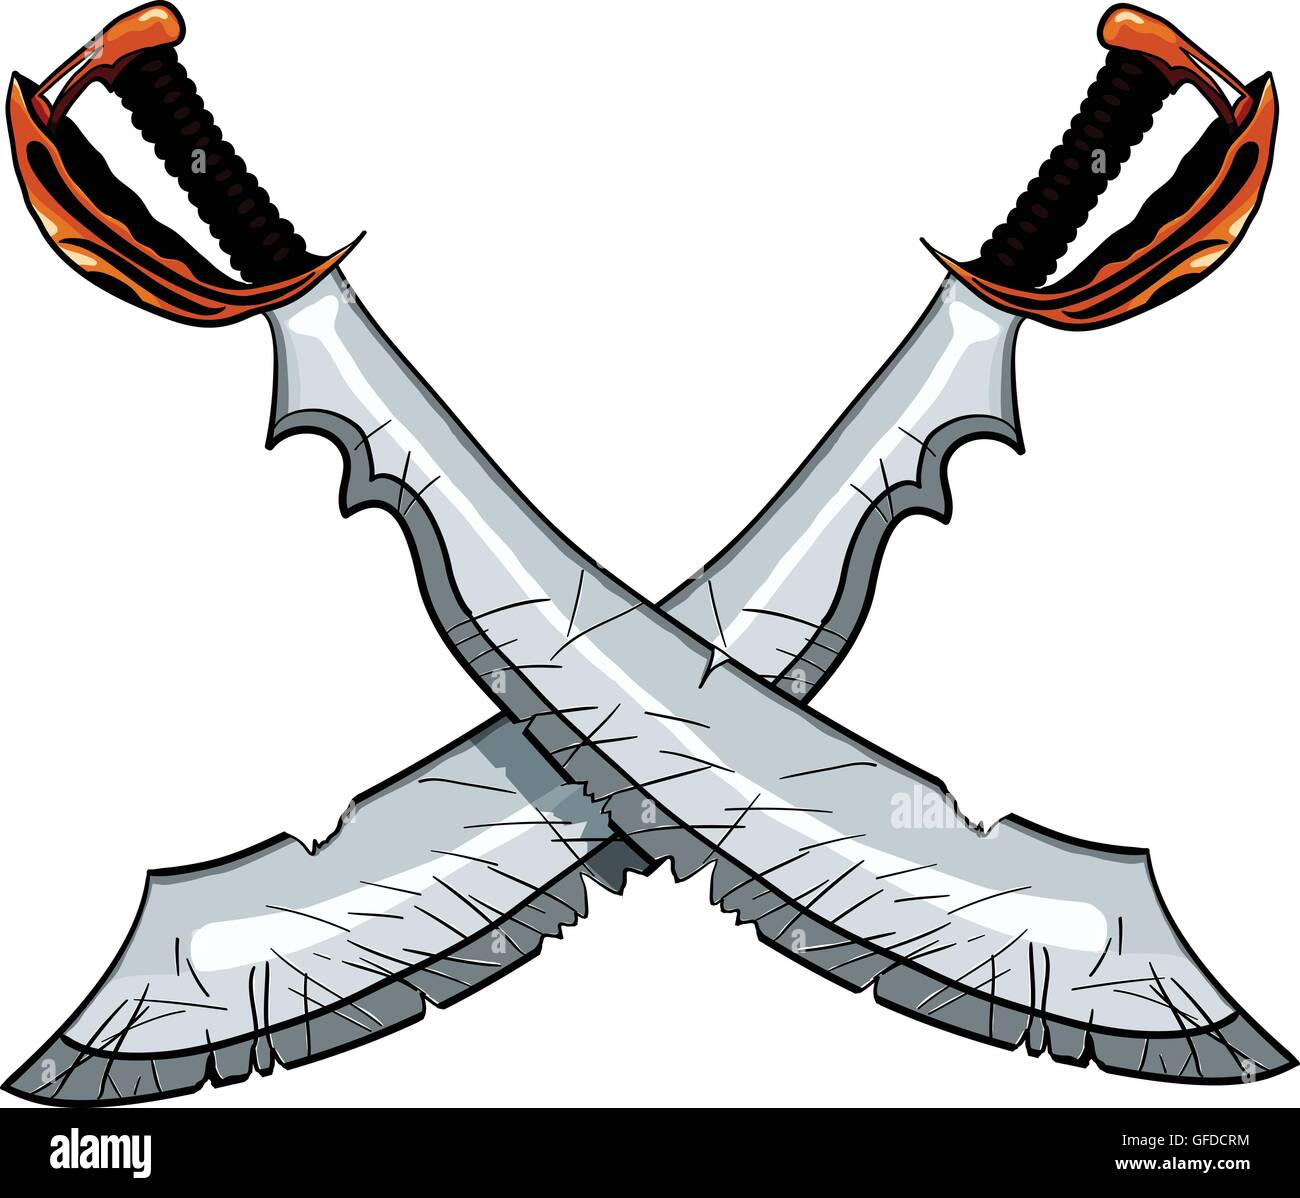 Crossed cutlass pirate sword vector illustration for tattoo or t-shirt design Stock Vector